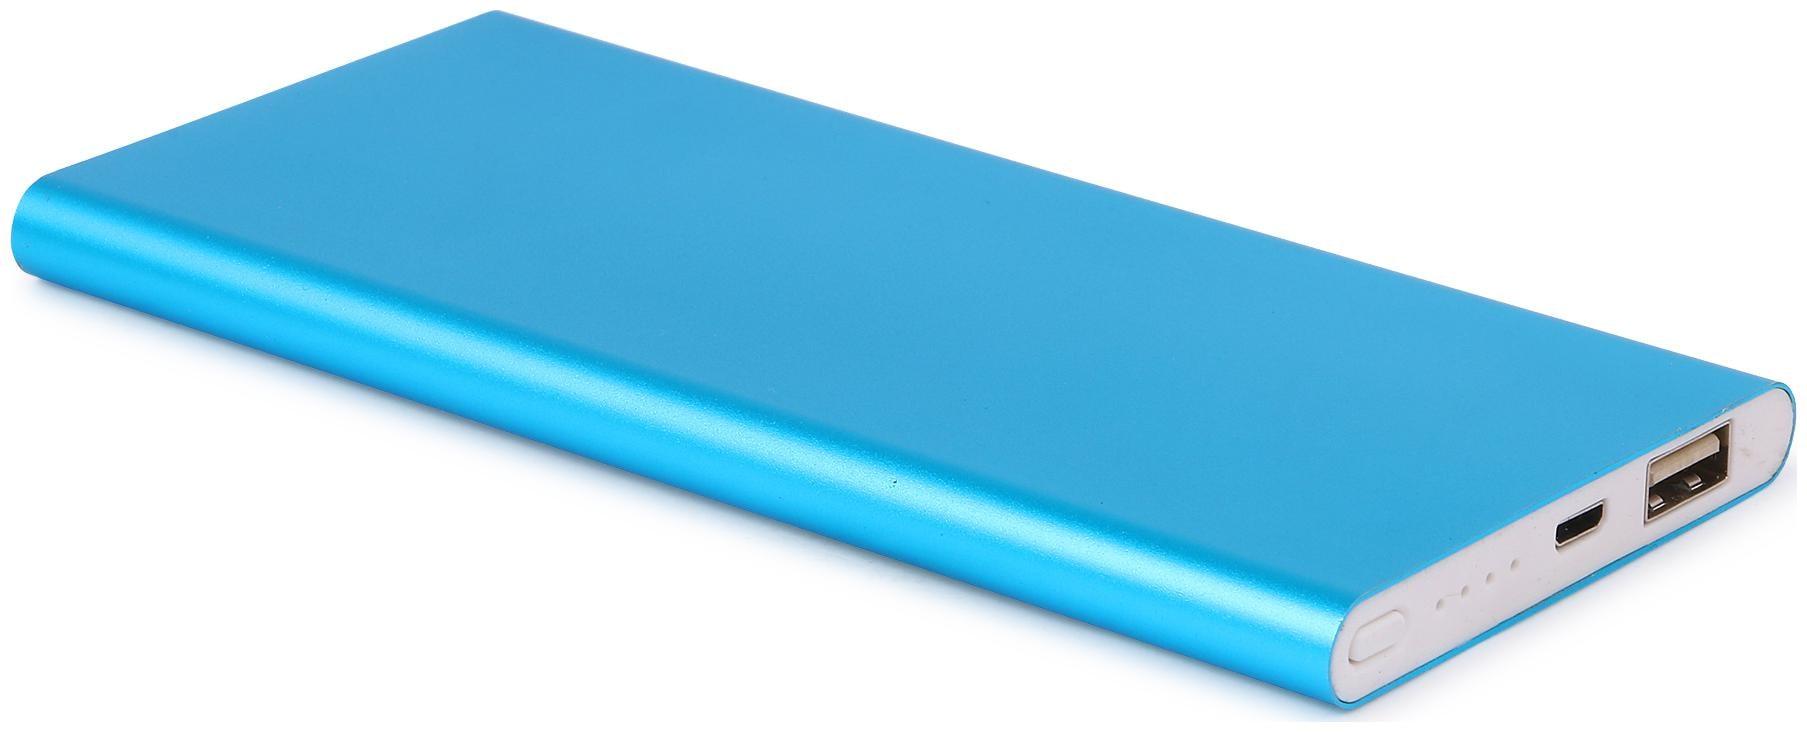 CRAWL 10.4K Pumi 10400 mAh Portable Power Bank - Blue